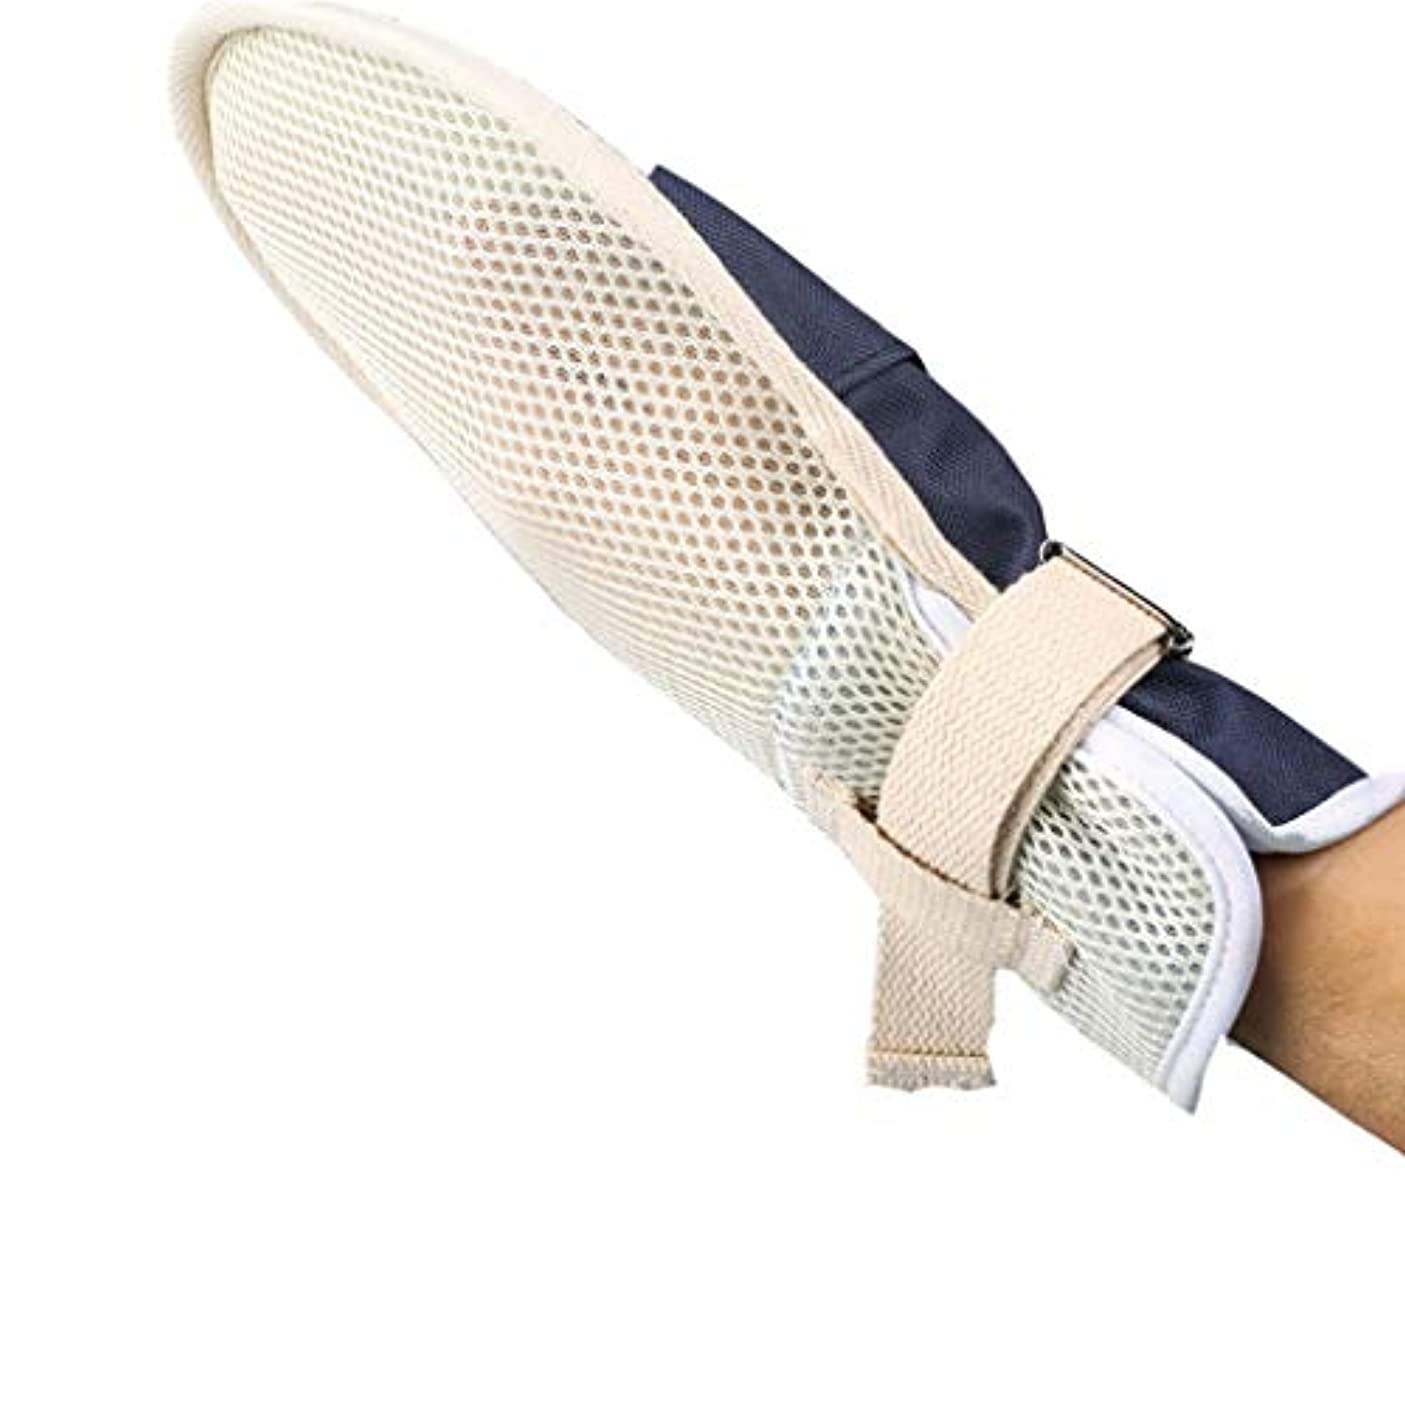 採用チャップ後方医療用拘束手袋 - Ospital医療用拘束手袋、予防患者の自己傷害